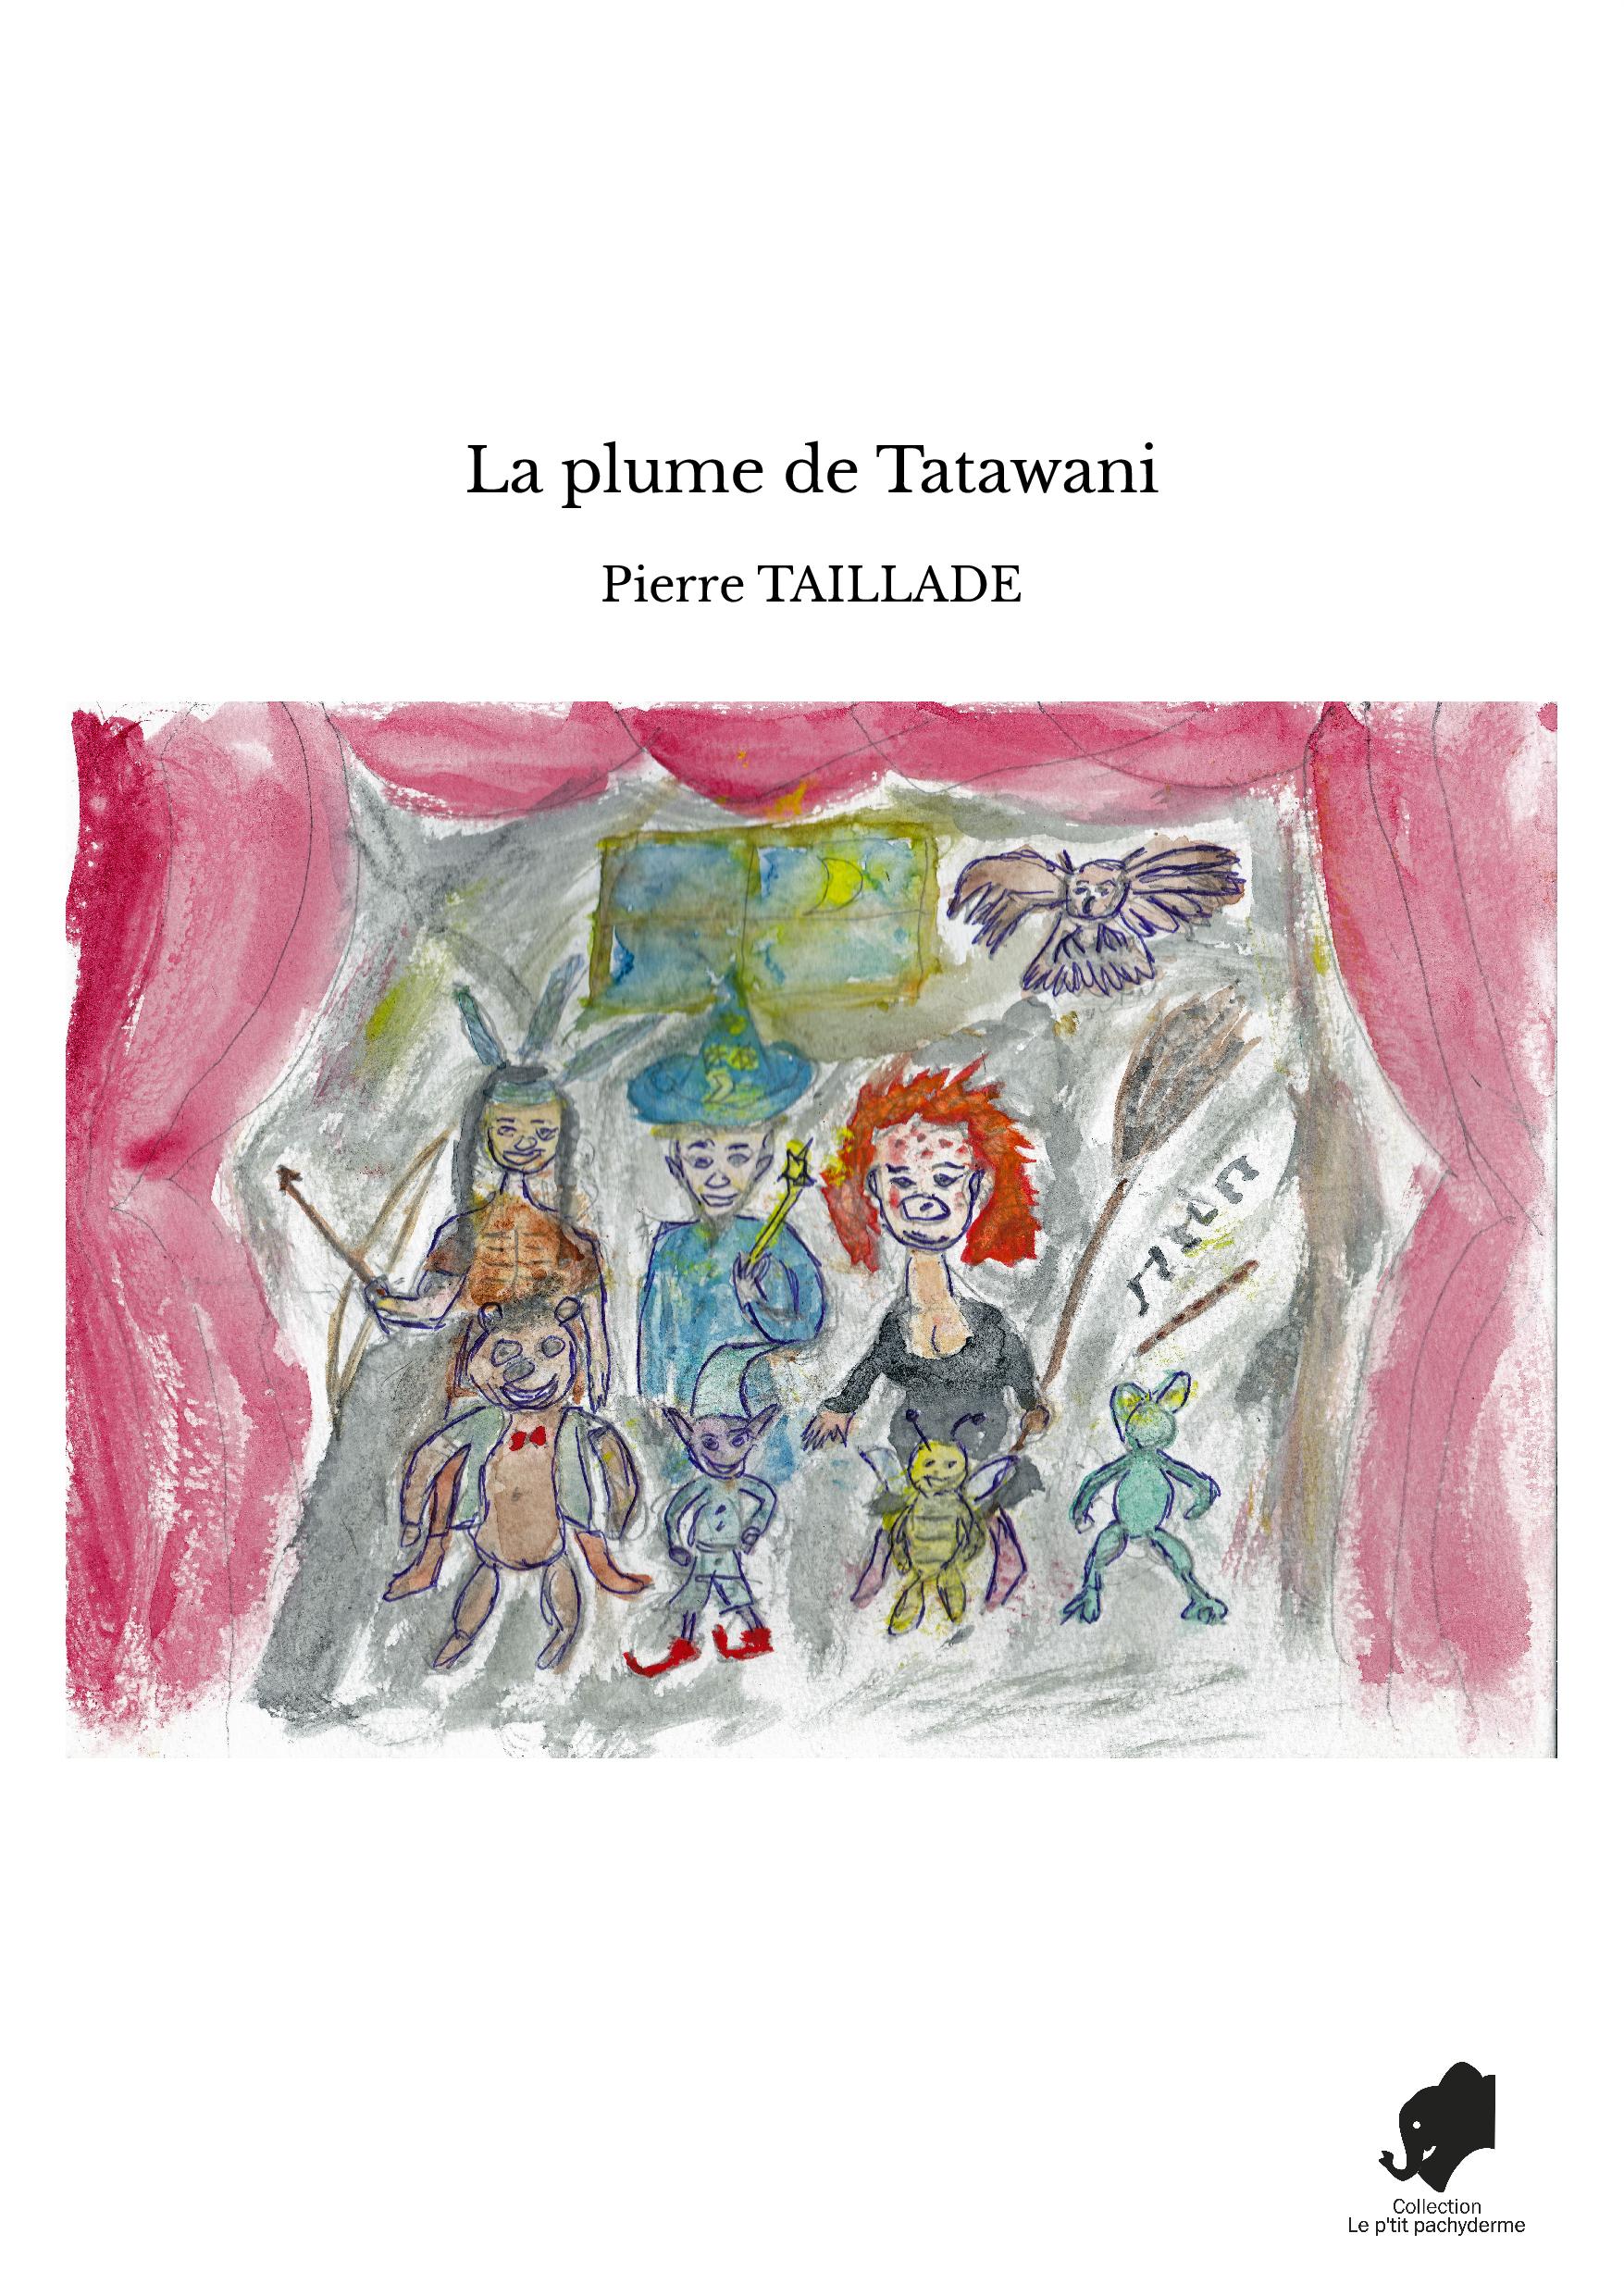 La plume de Tatawani